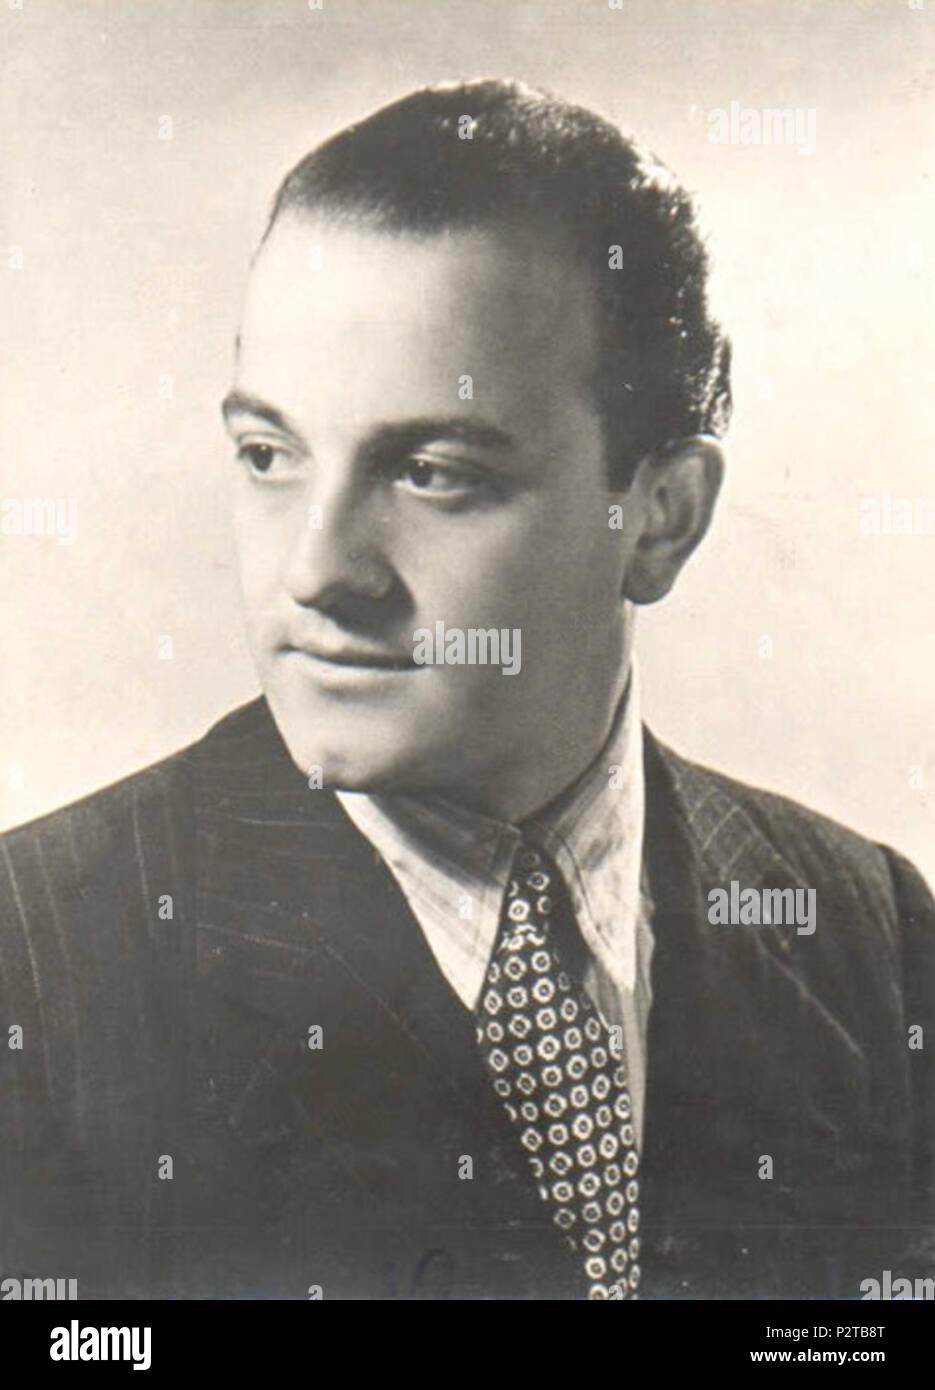 . Publicity postcard of Gianni Ravera, Italian singer, entrepreneur, festival organizer and record producer. 1940s. Unknown 34 Gianni Ravera anni 40 Stock Photo